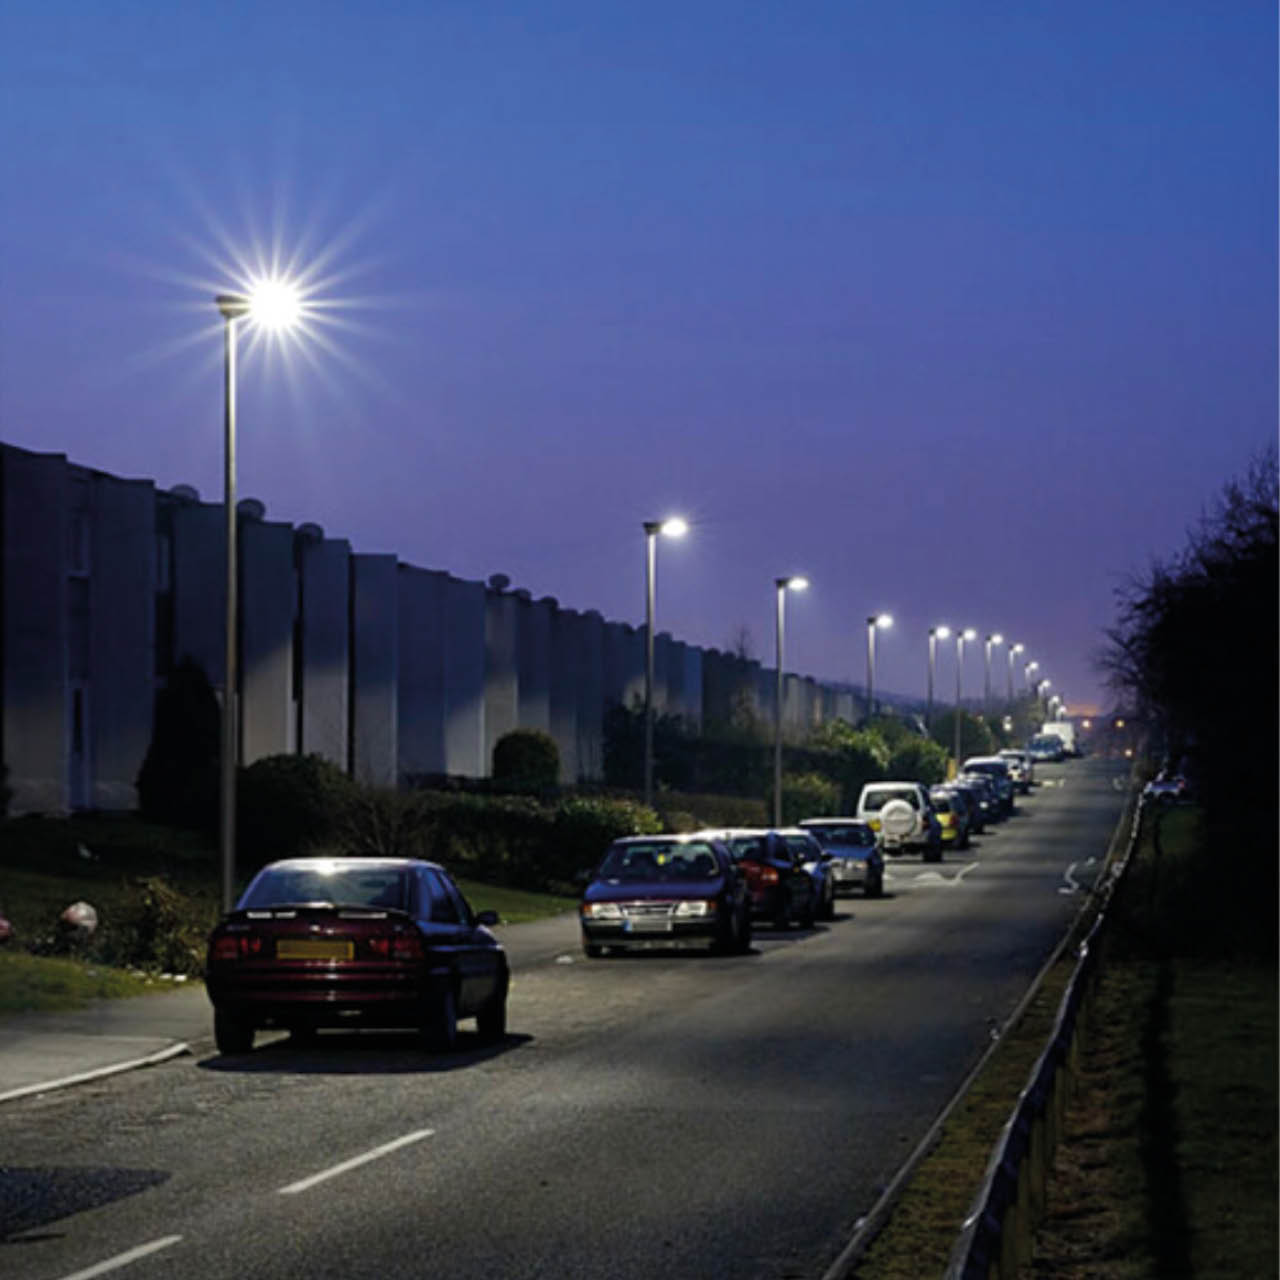 S278 lighting design Urban street